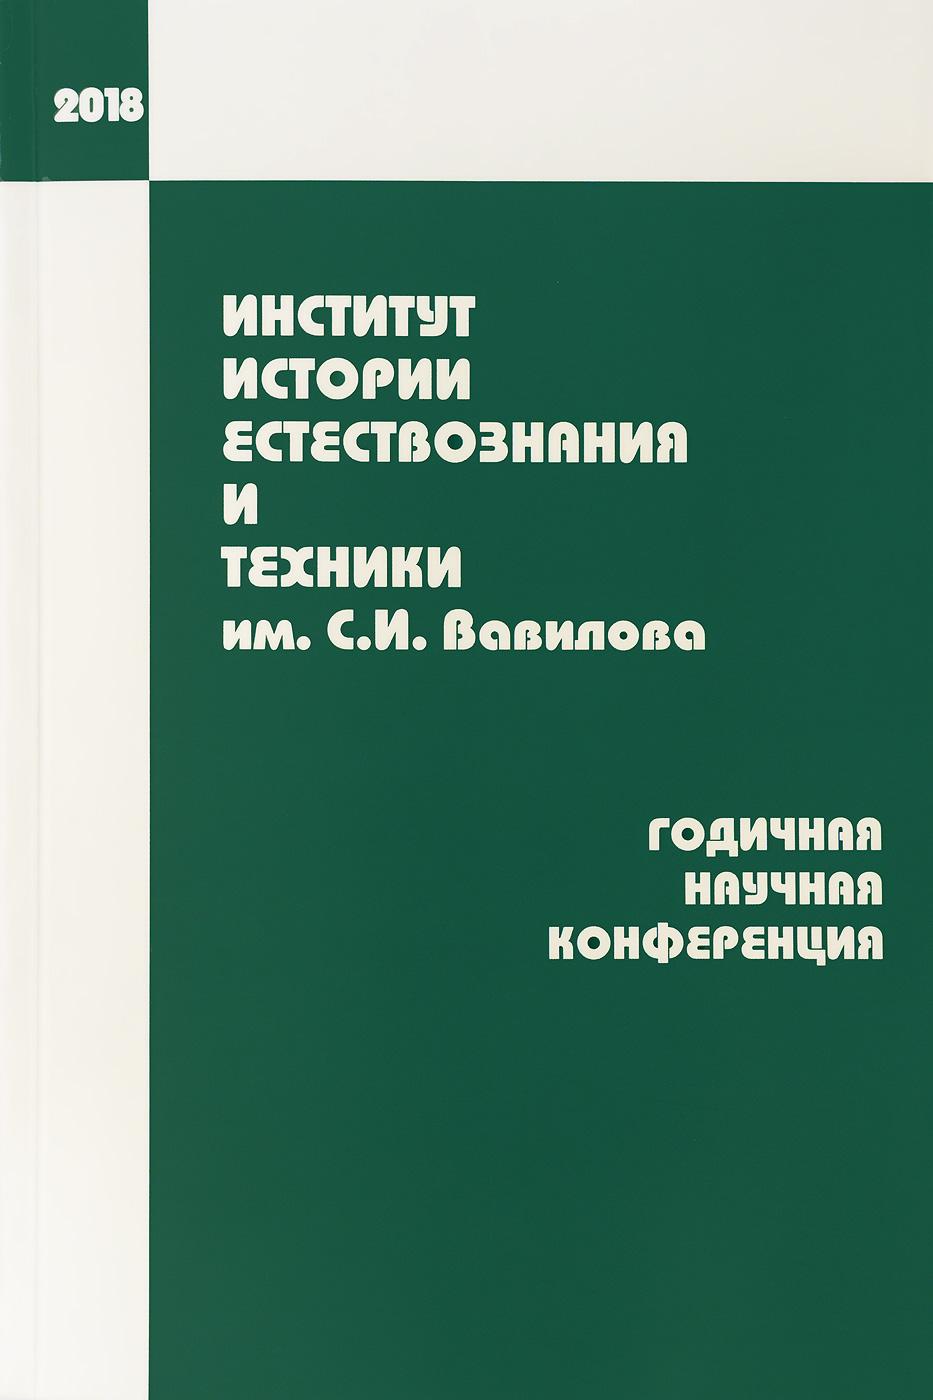 XXVI Годичная научная конференция ИИЕТ РАН